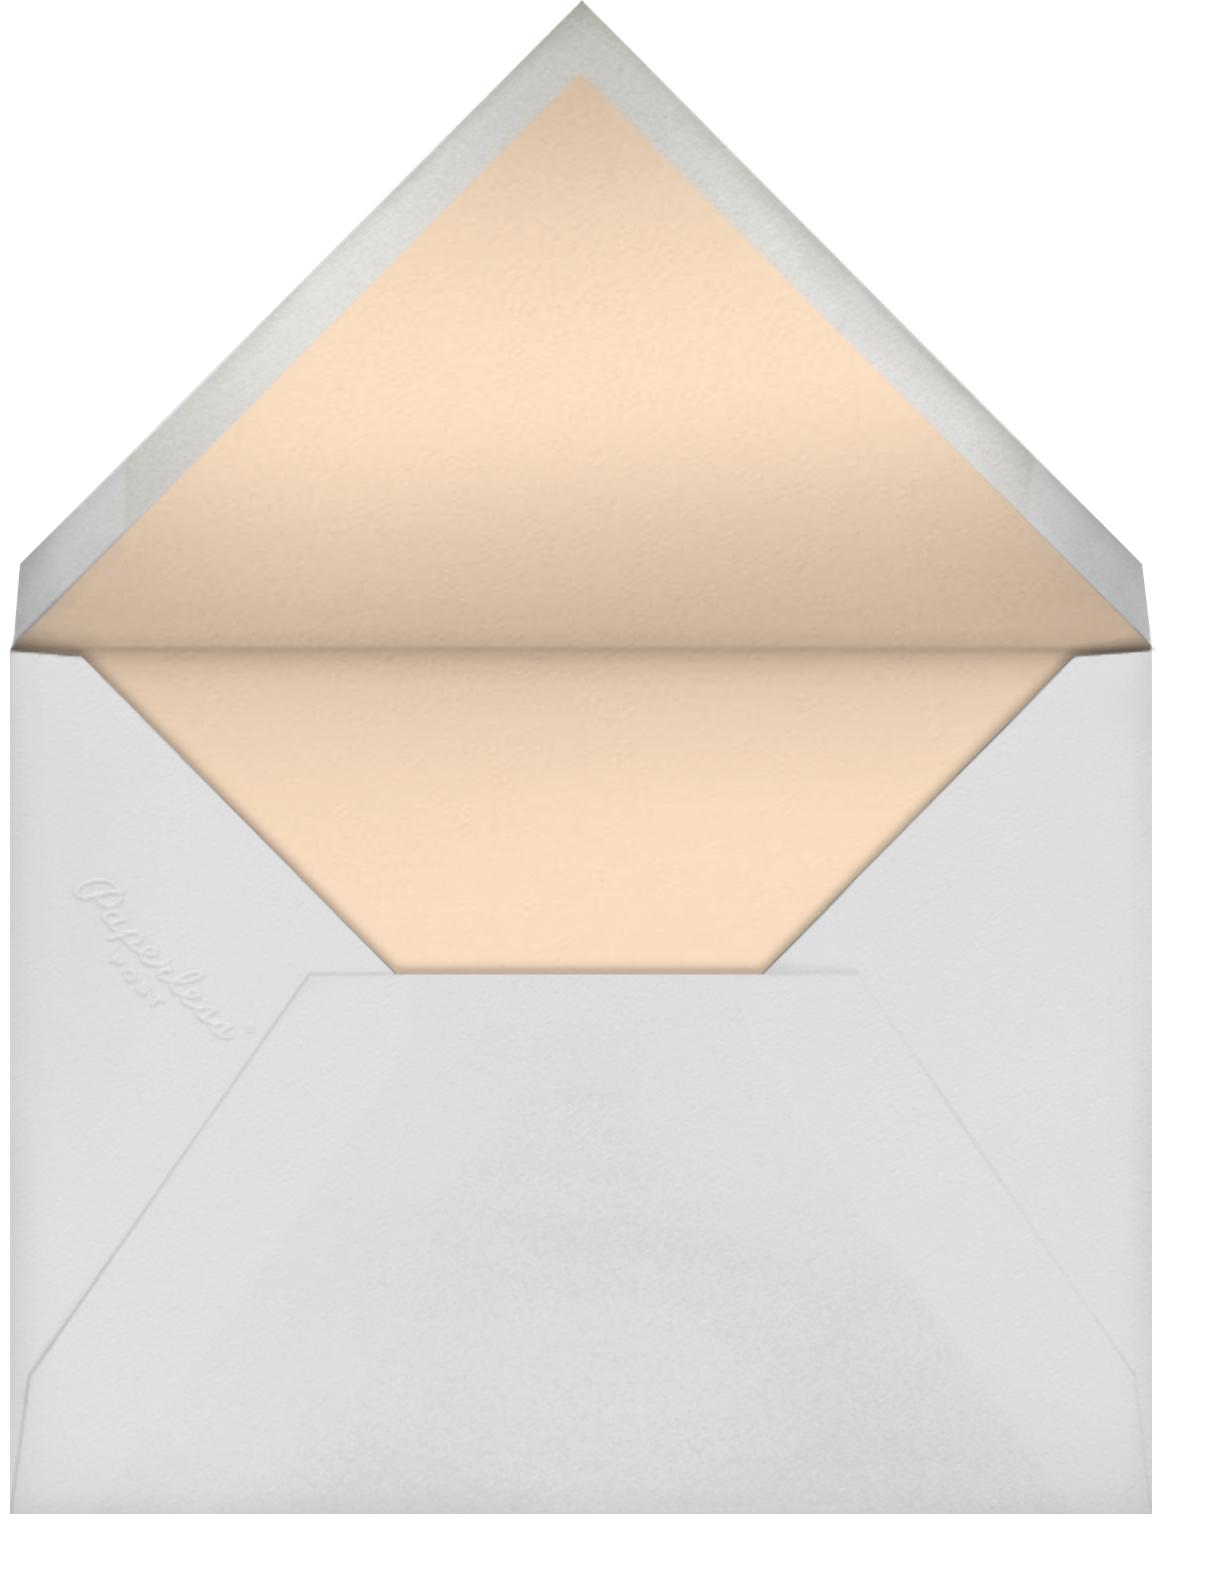 Painted Spots - Pink/Blue - Sugar Paper - 1st birthday - envelope back